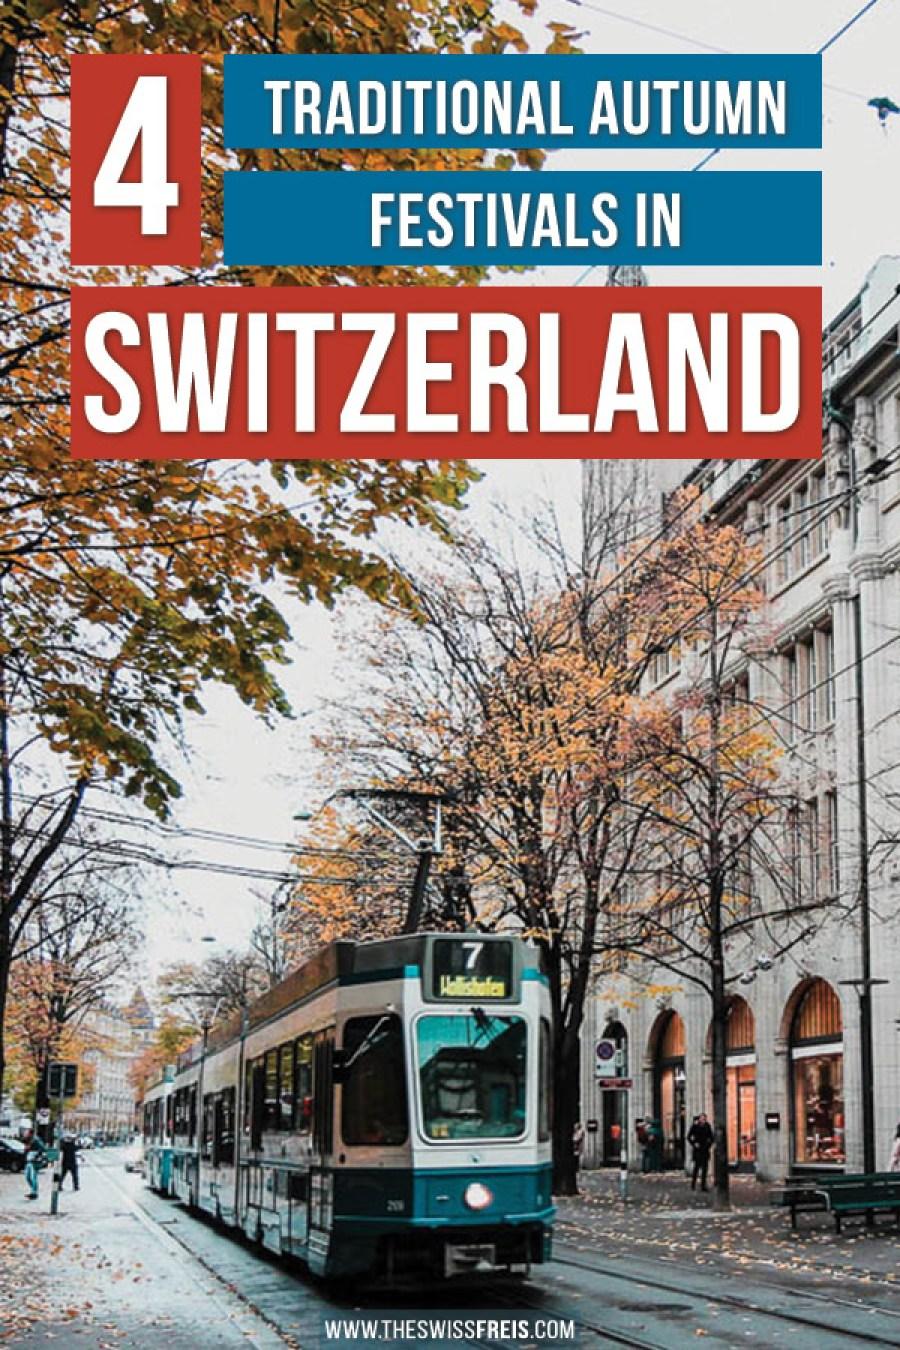 4 Traditional Autumn Festivals in Switzerland #autumn #switzerland #europe #autumntravel #autumnfestivals